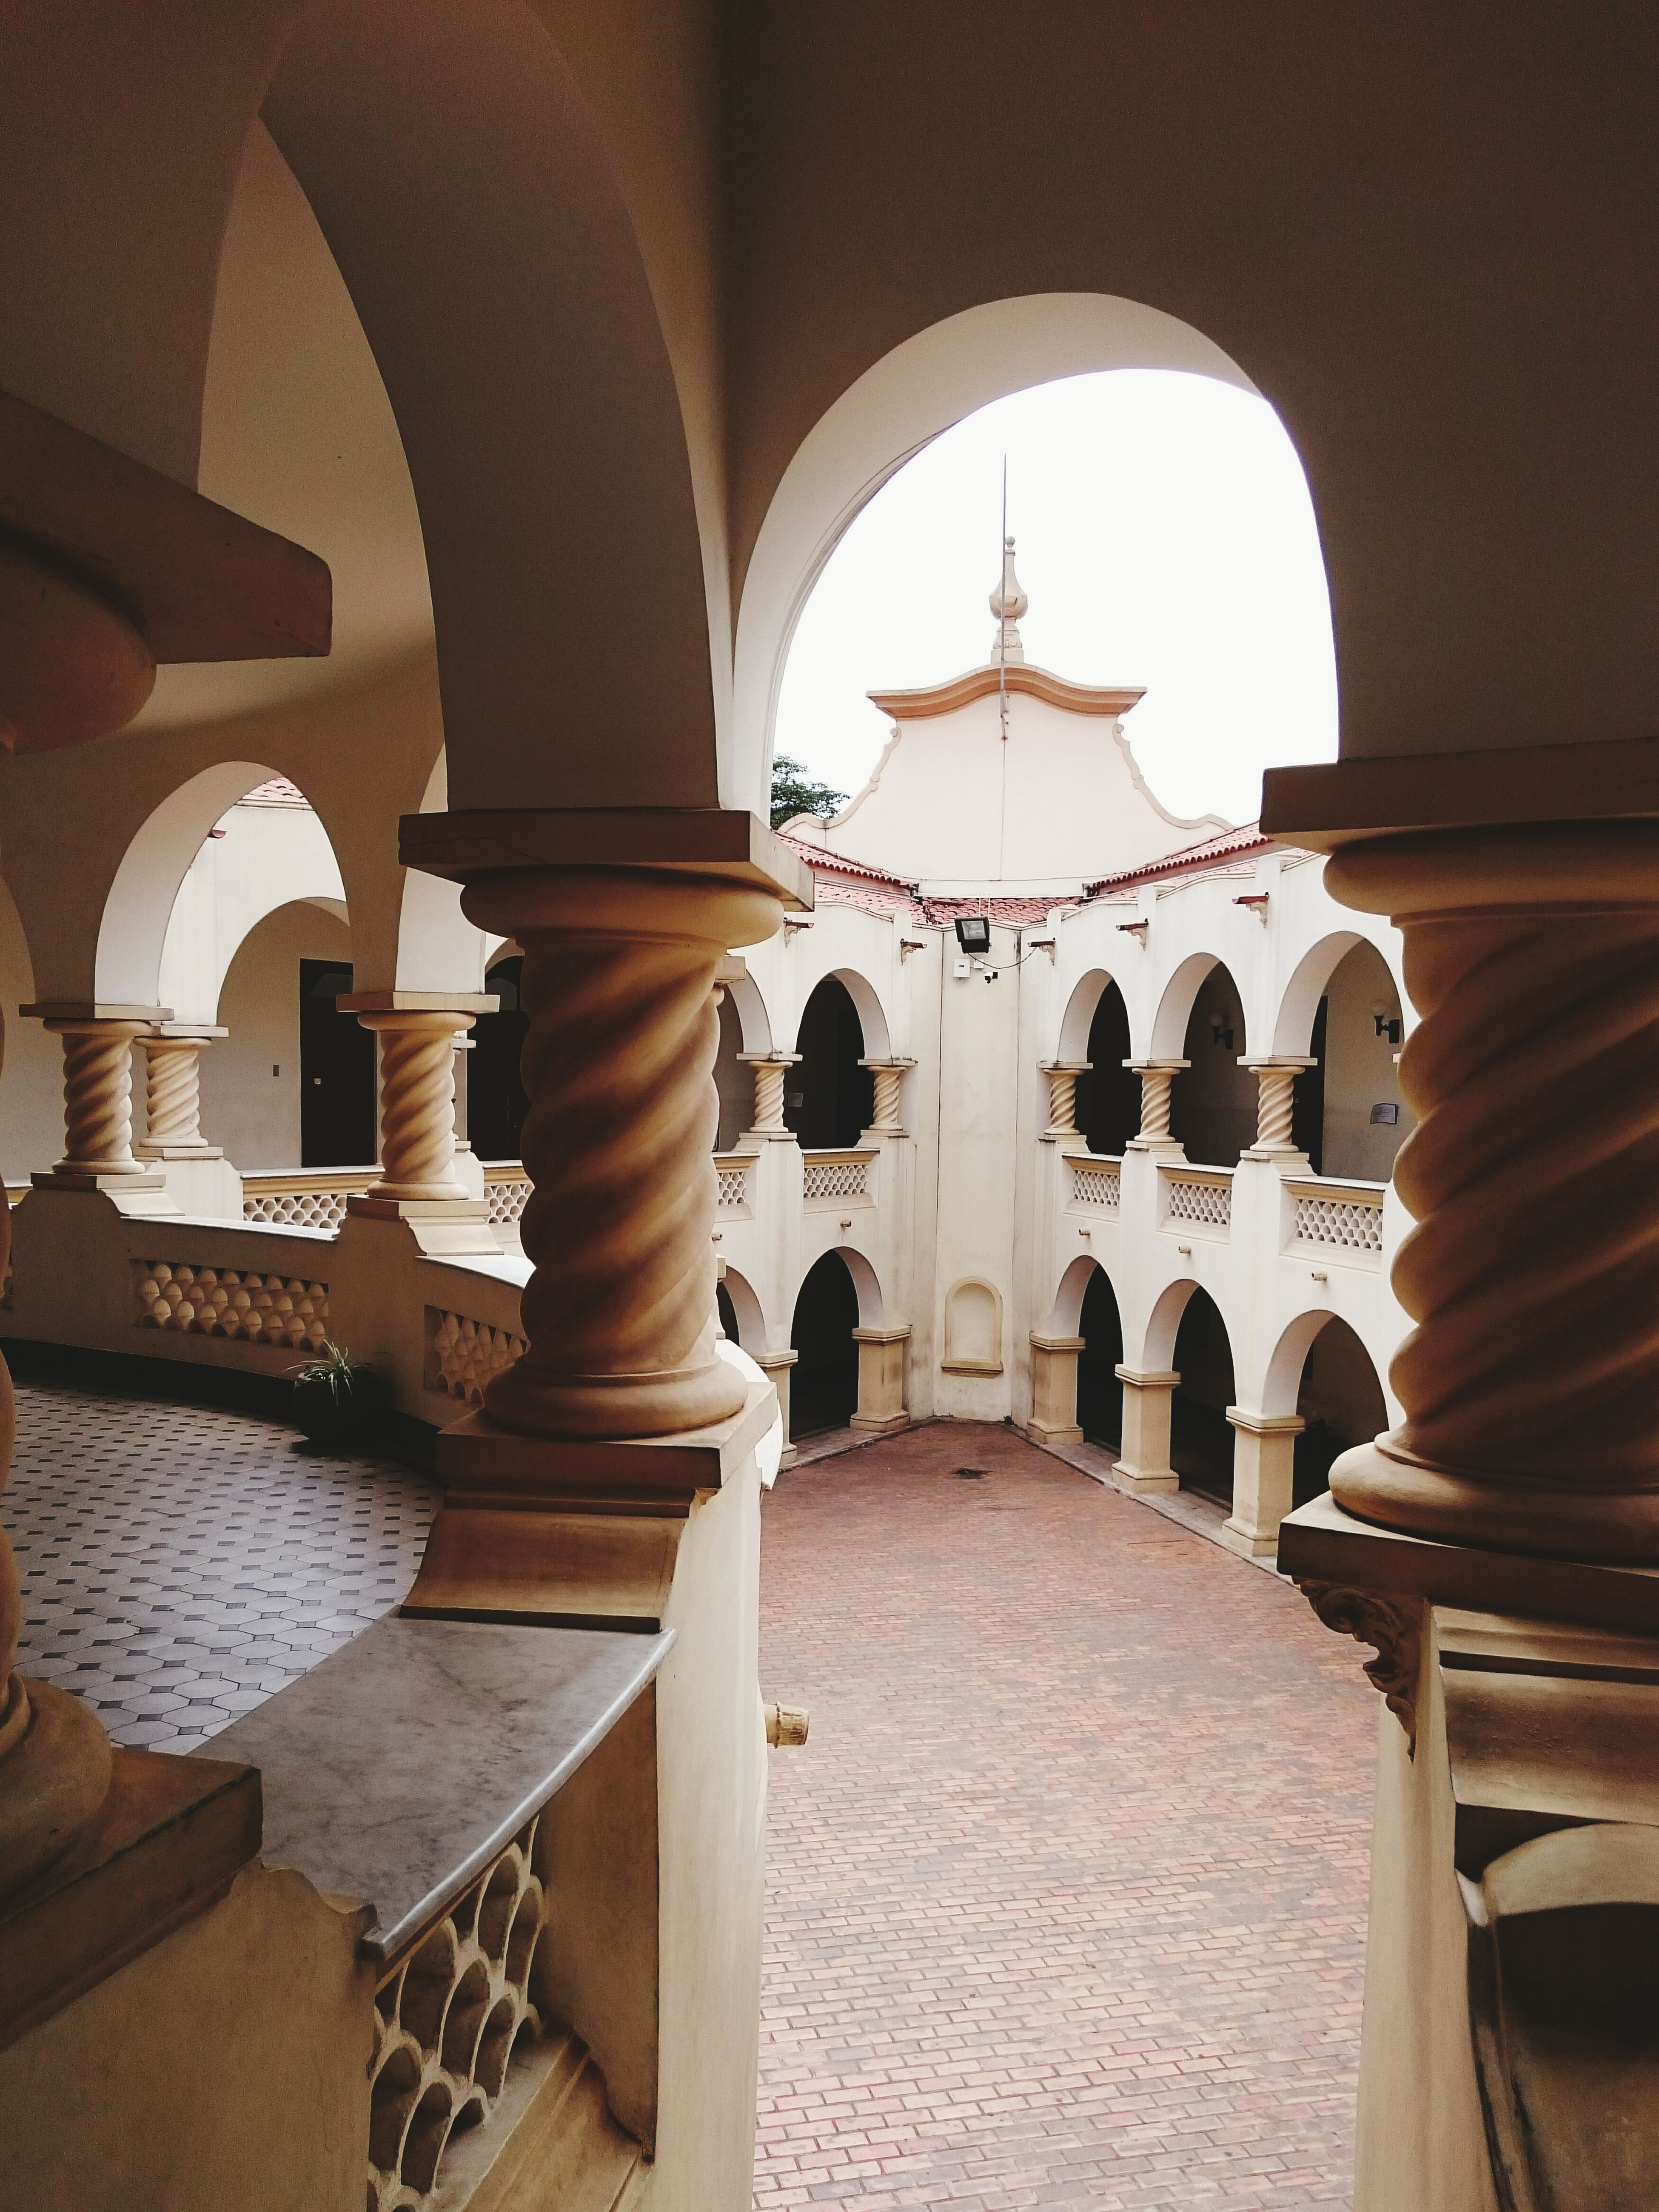 Architecture Belohorizonte School Ivan_mont